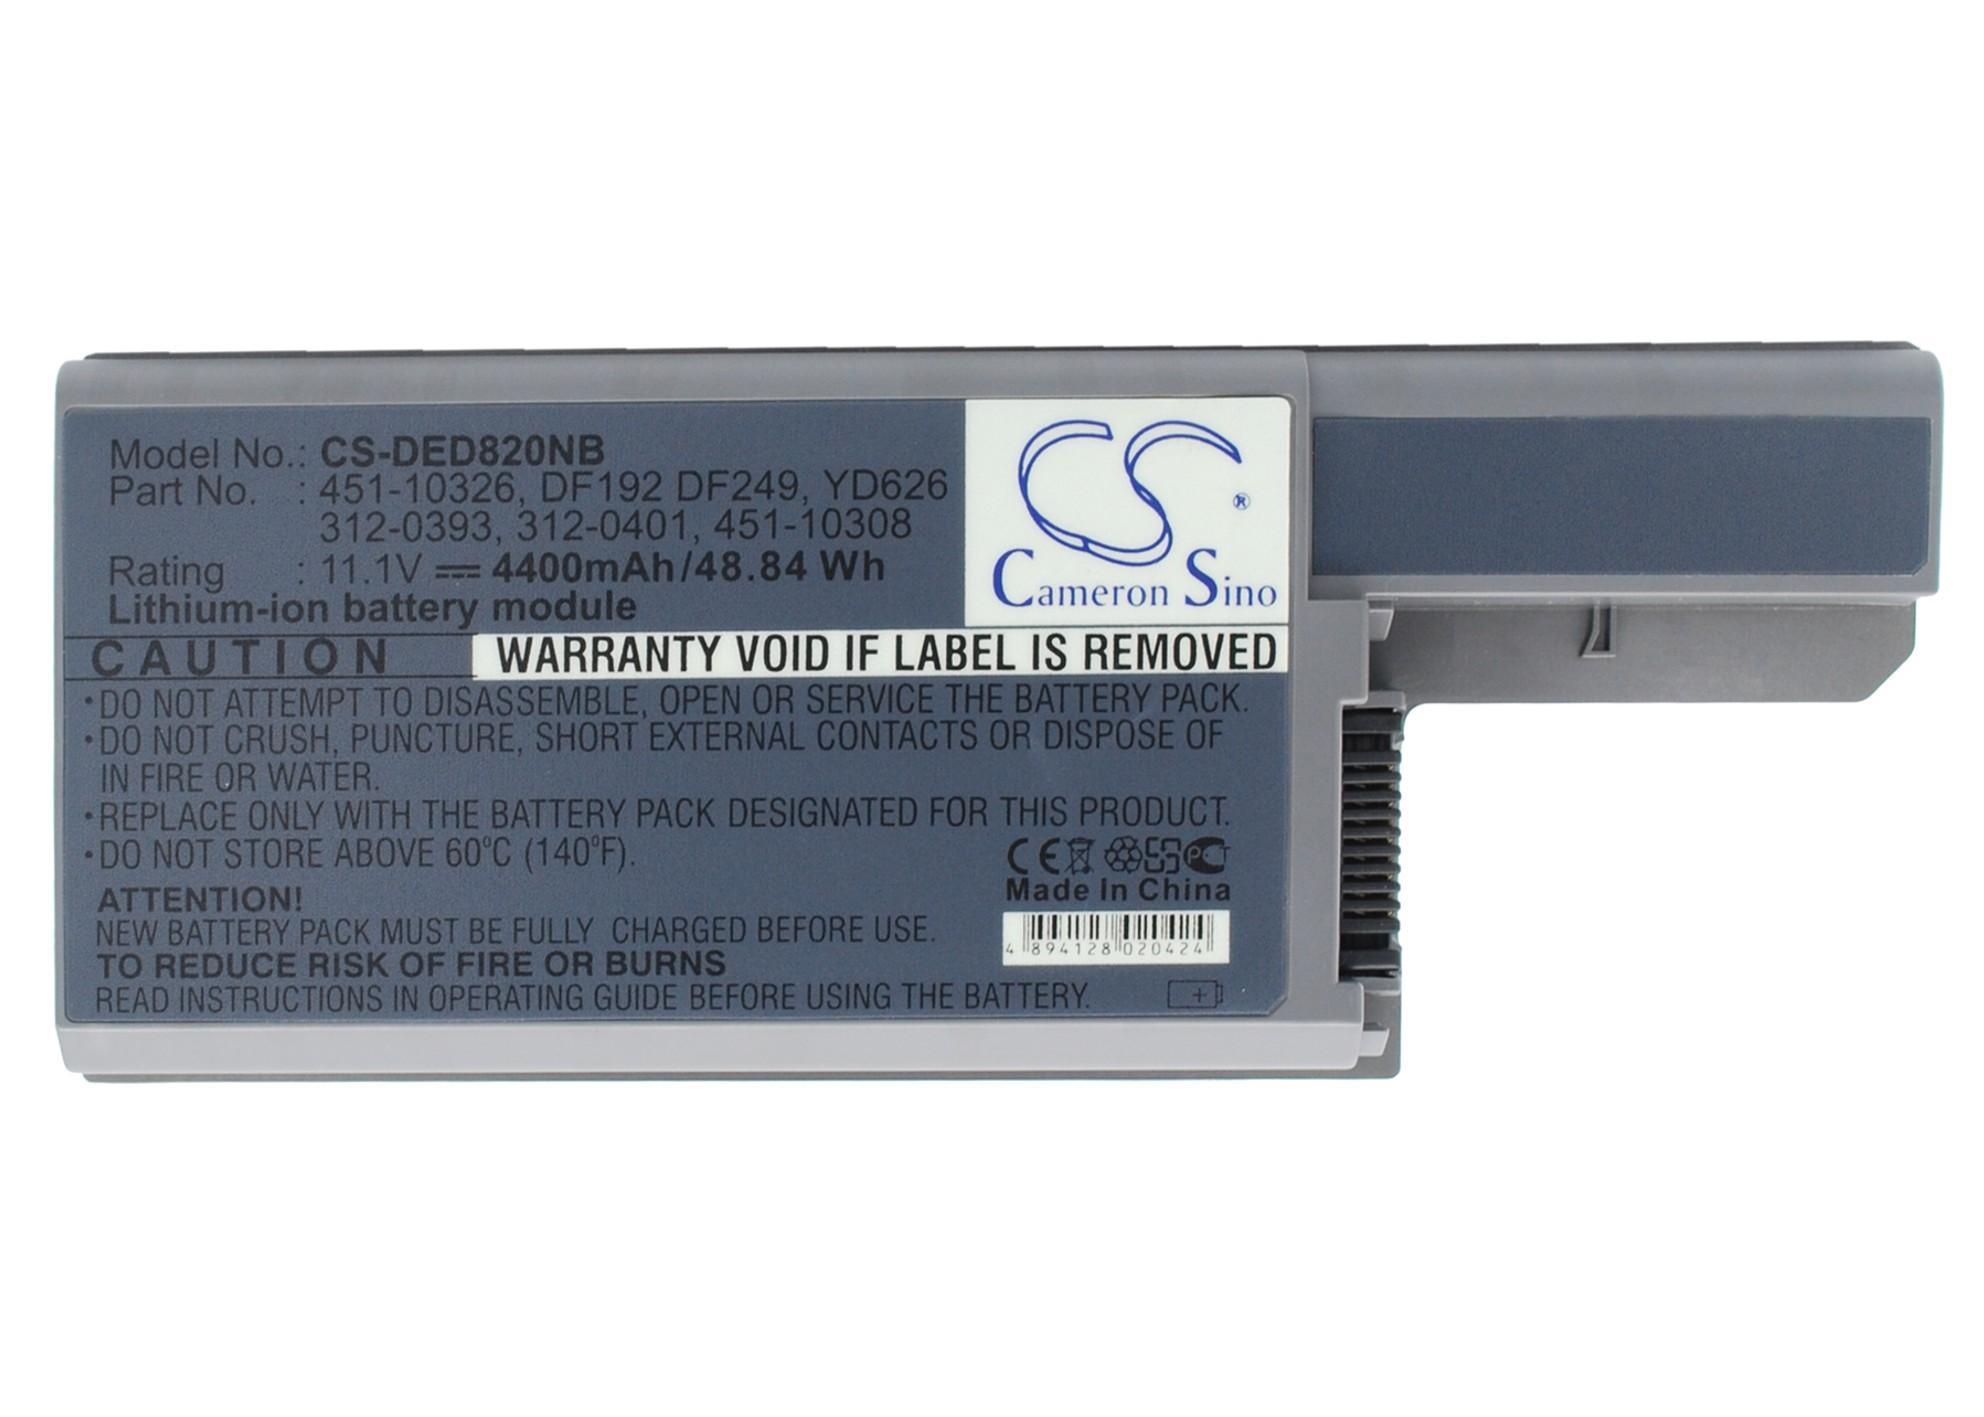 Батерия за лаптоп DELL Latitude D820/D830, 11.1V, 4400mAh, Черен, Cameron sino